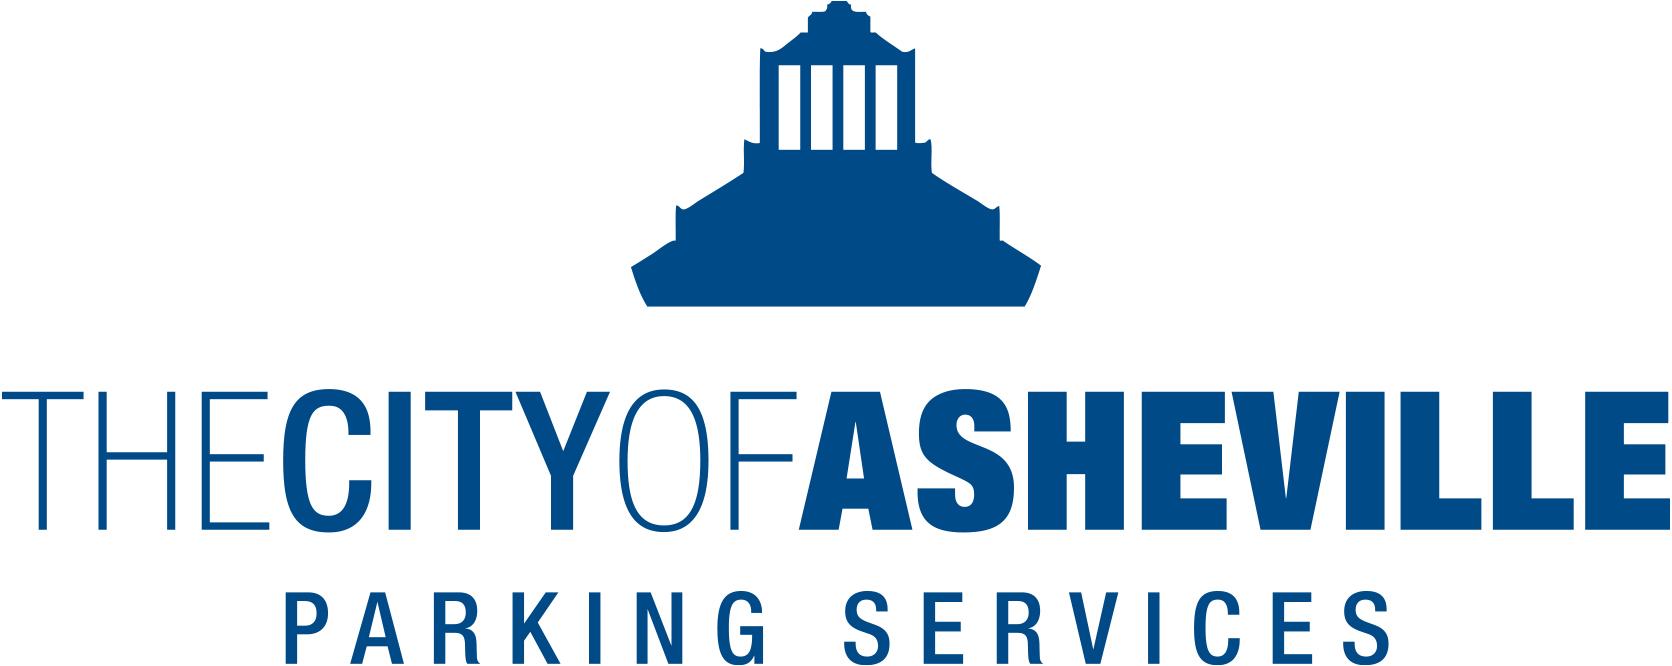 City of Asheville Parking Services Division